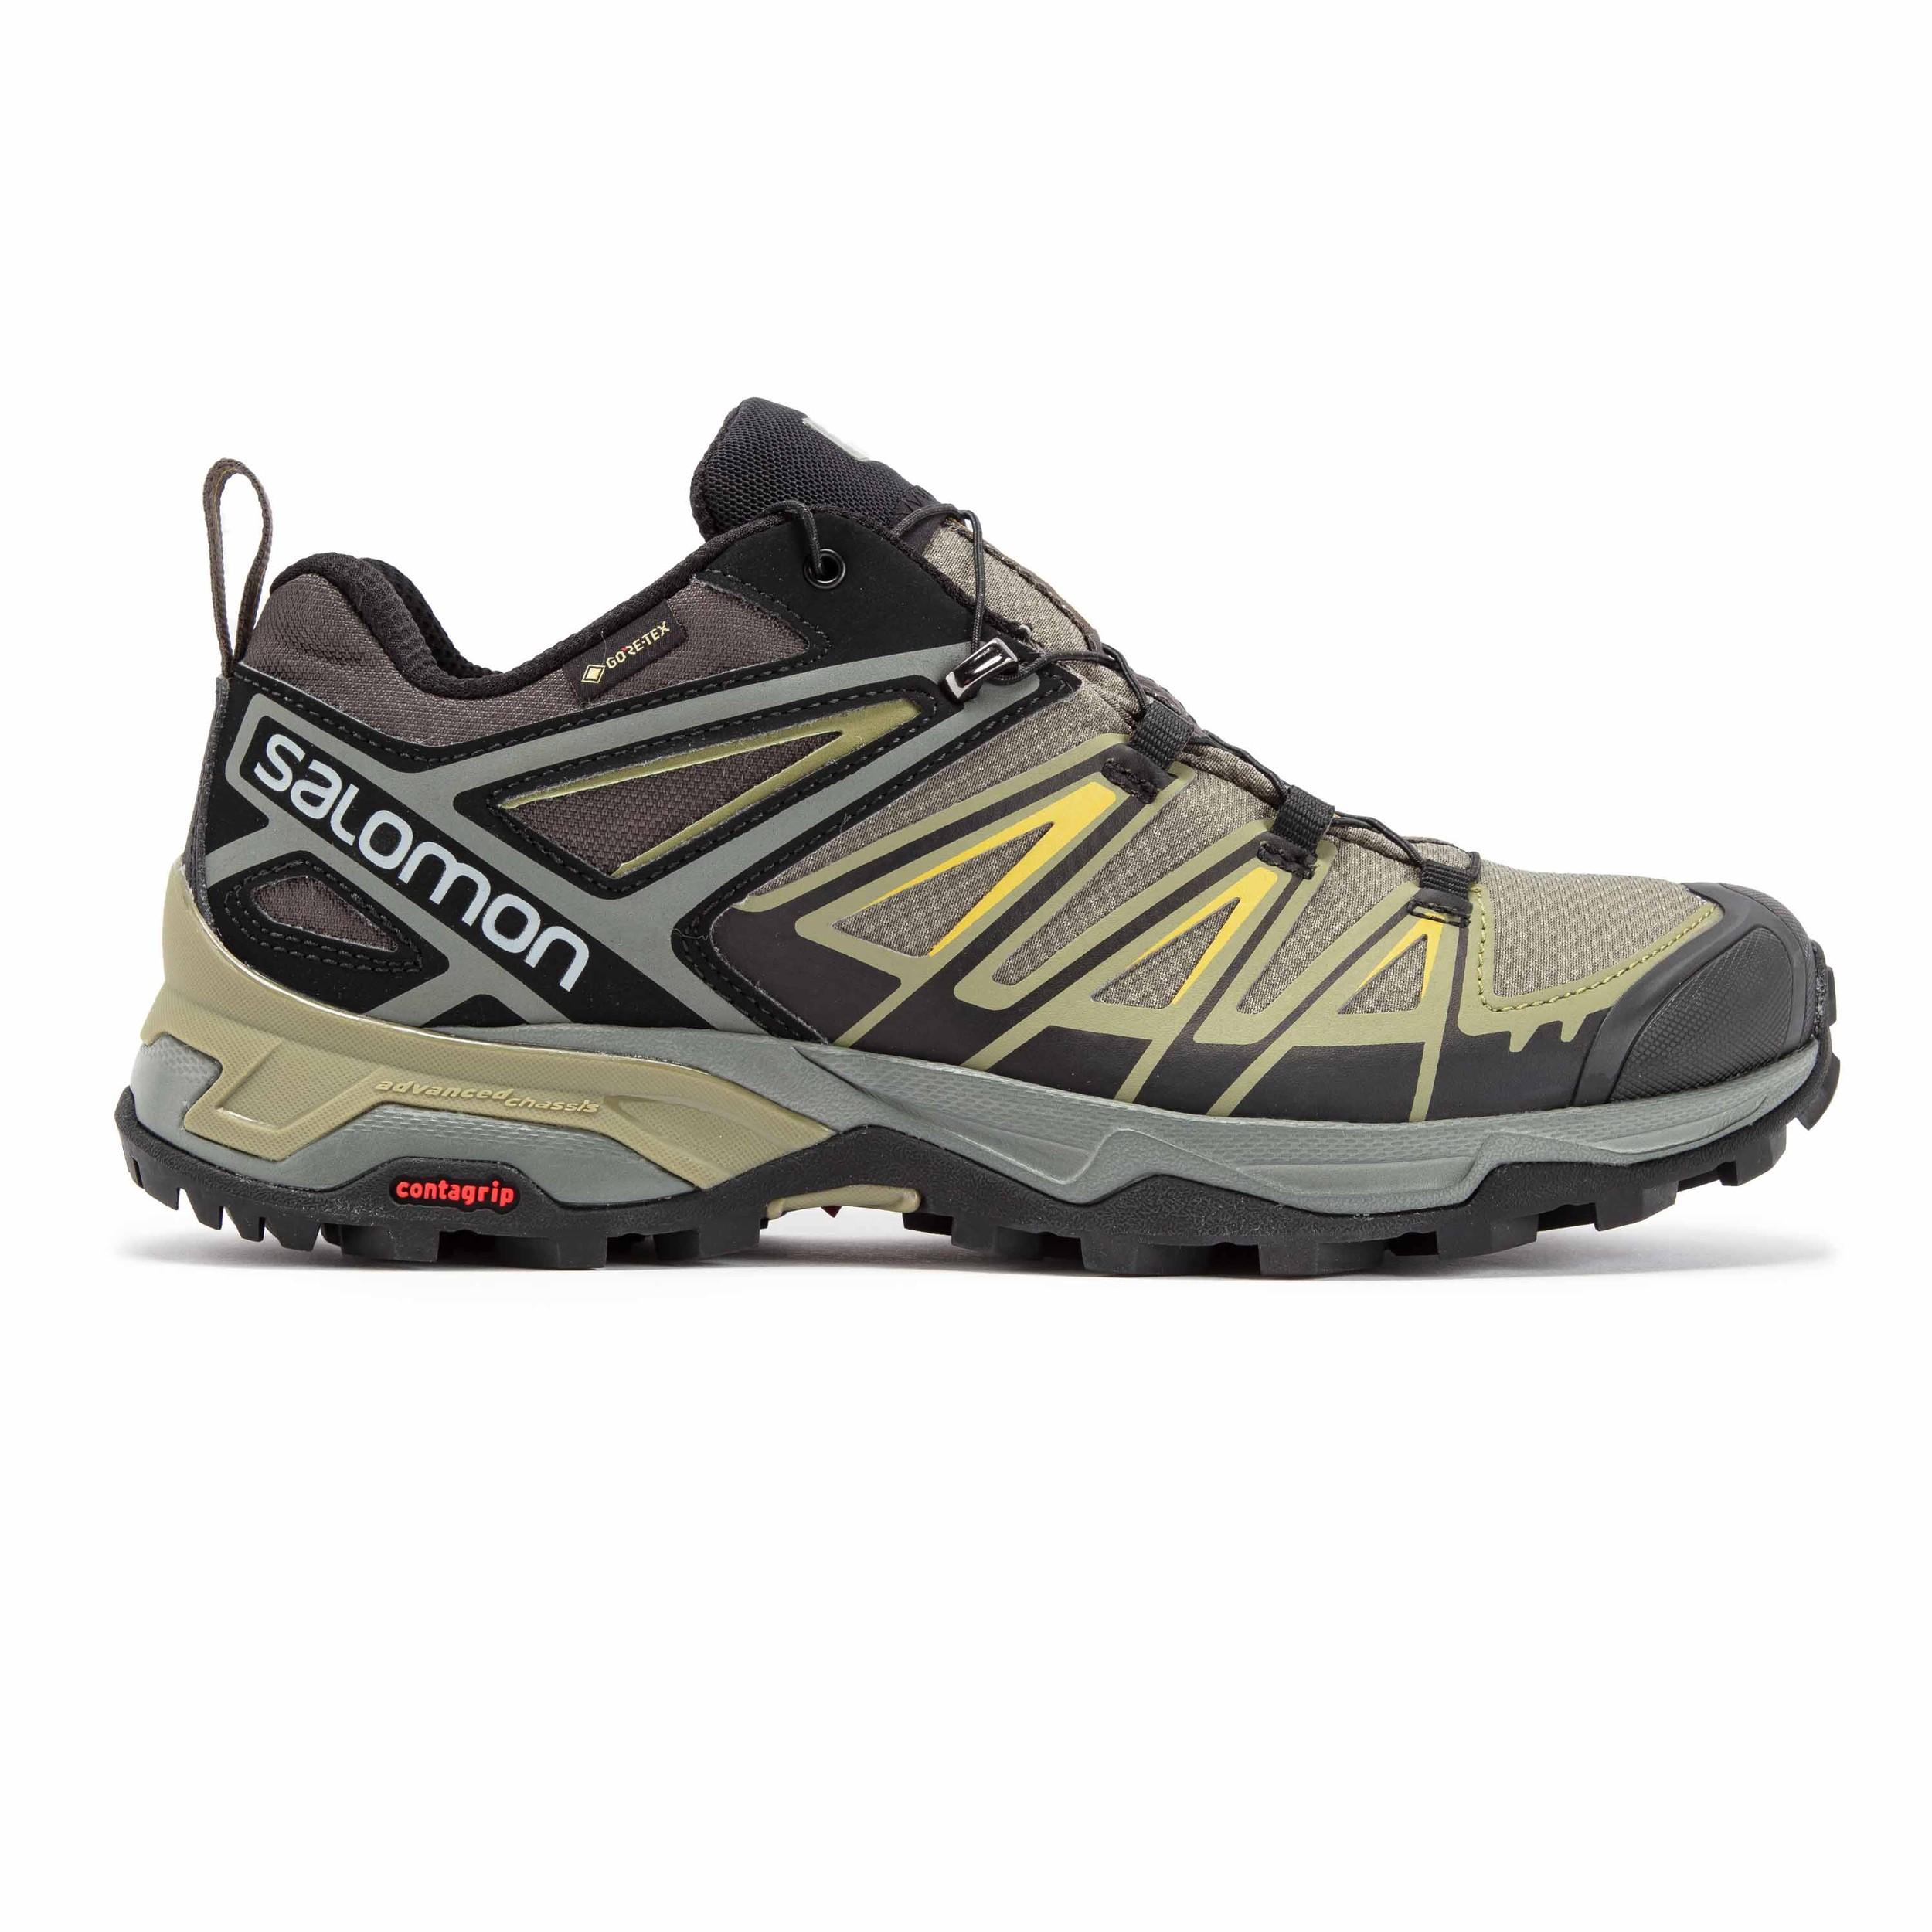 Salomon Uomo X Ultra 3 Scarpe da Trekking Scarponi Mid Gore-Tex Verde Sport 870b3cfe125